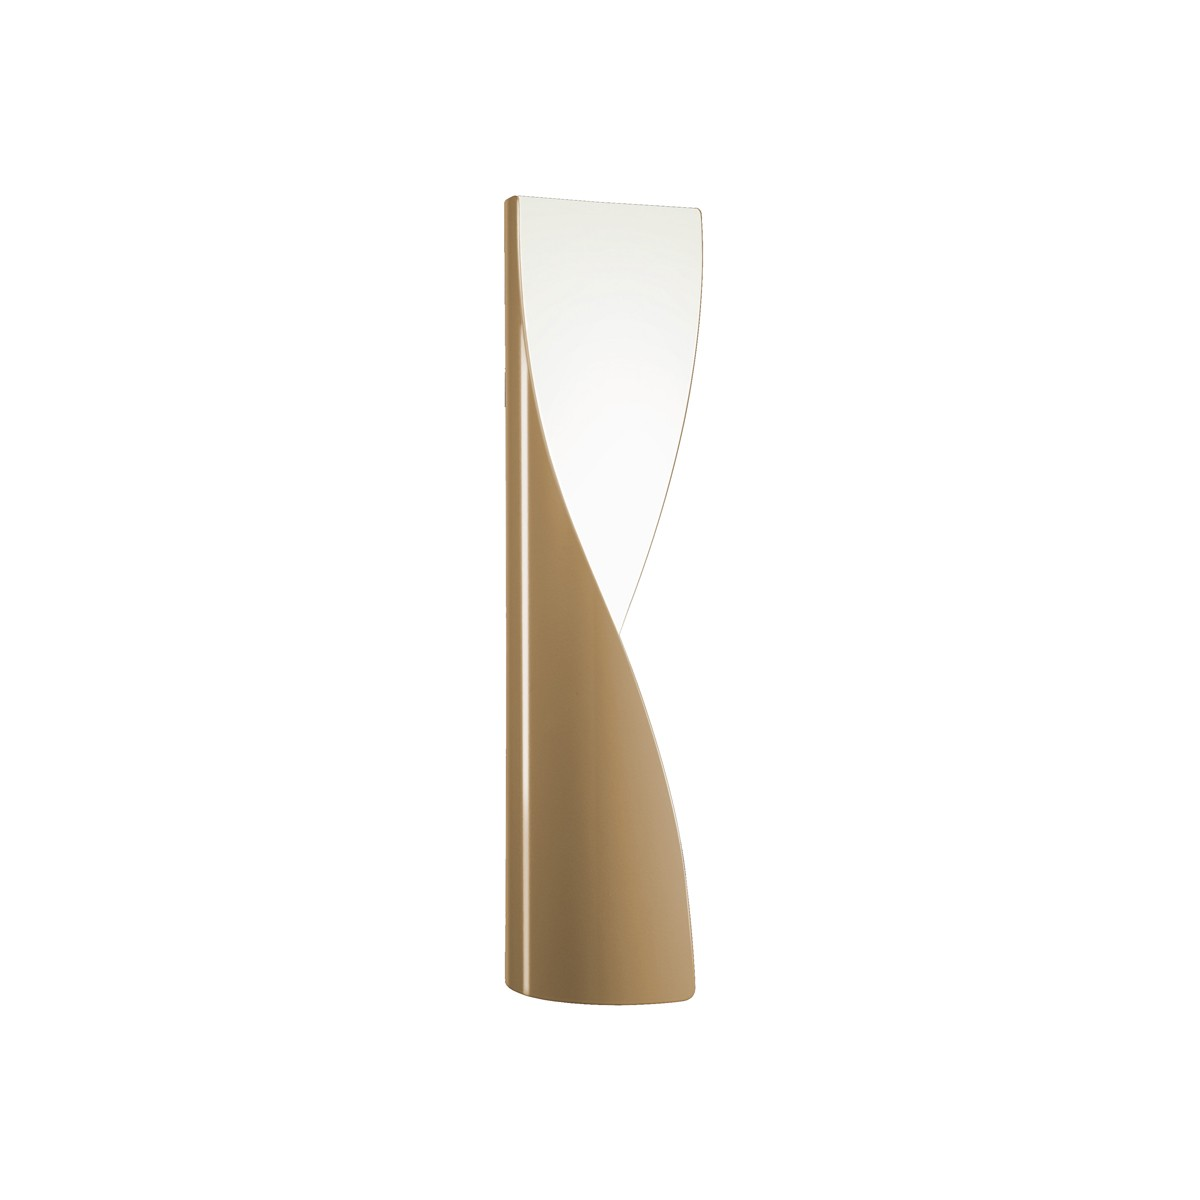 Kundalini Evita LED Wandleuchte, beige glänzend